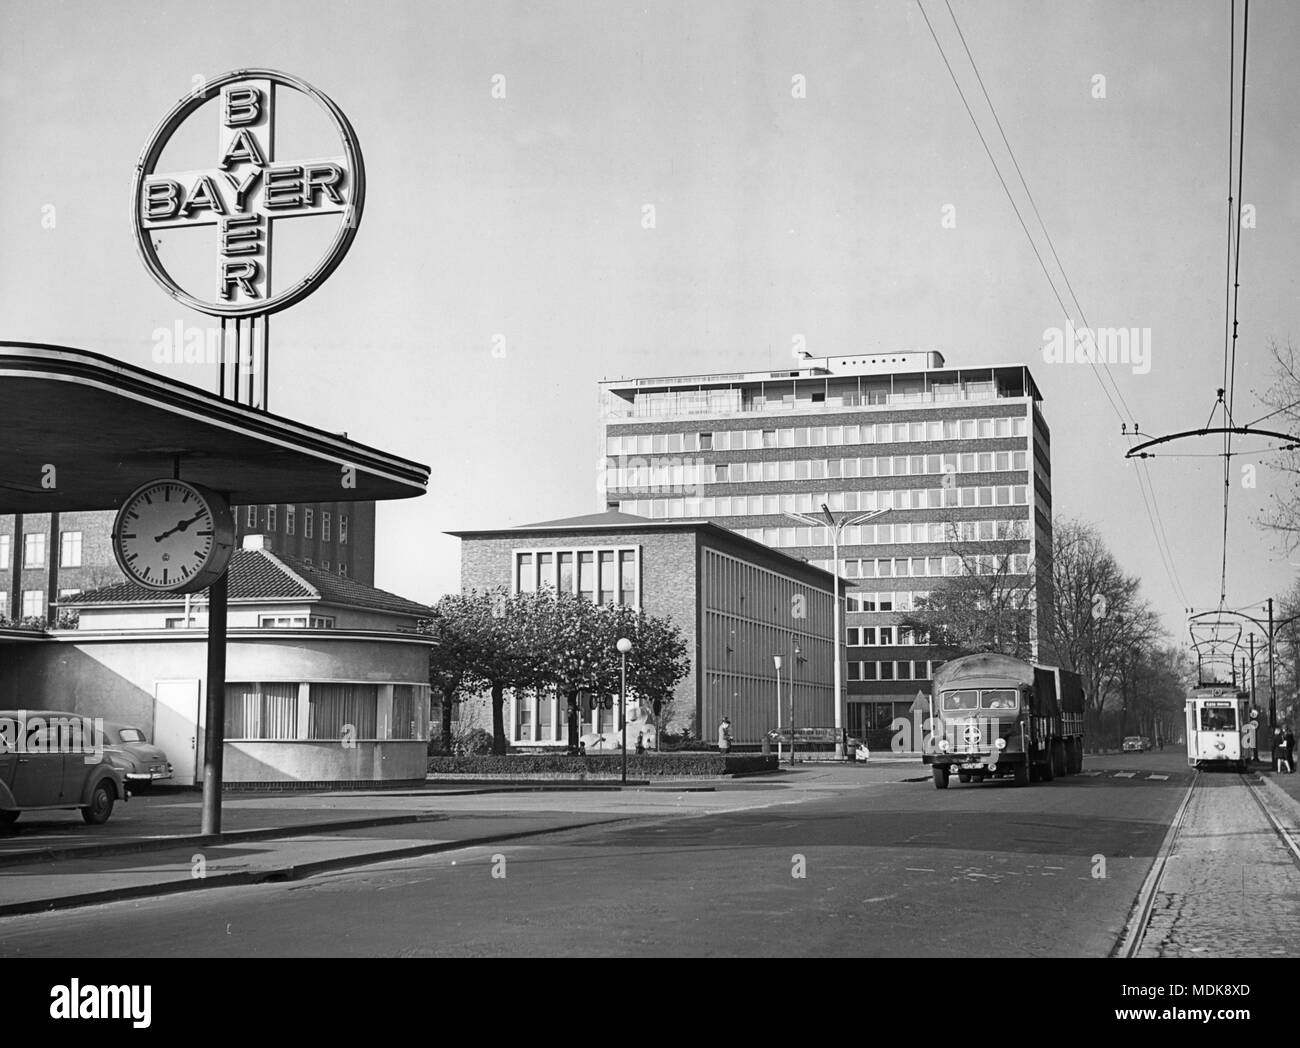 Das Bayer Kreuz am Eingang der Bayer AG in Leverkusen, 1955 fotografiert. Foto: Otto Noecker (c) dpa-Bericht | Verwendung weltweit Stockbild